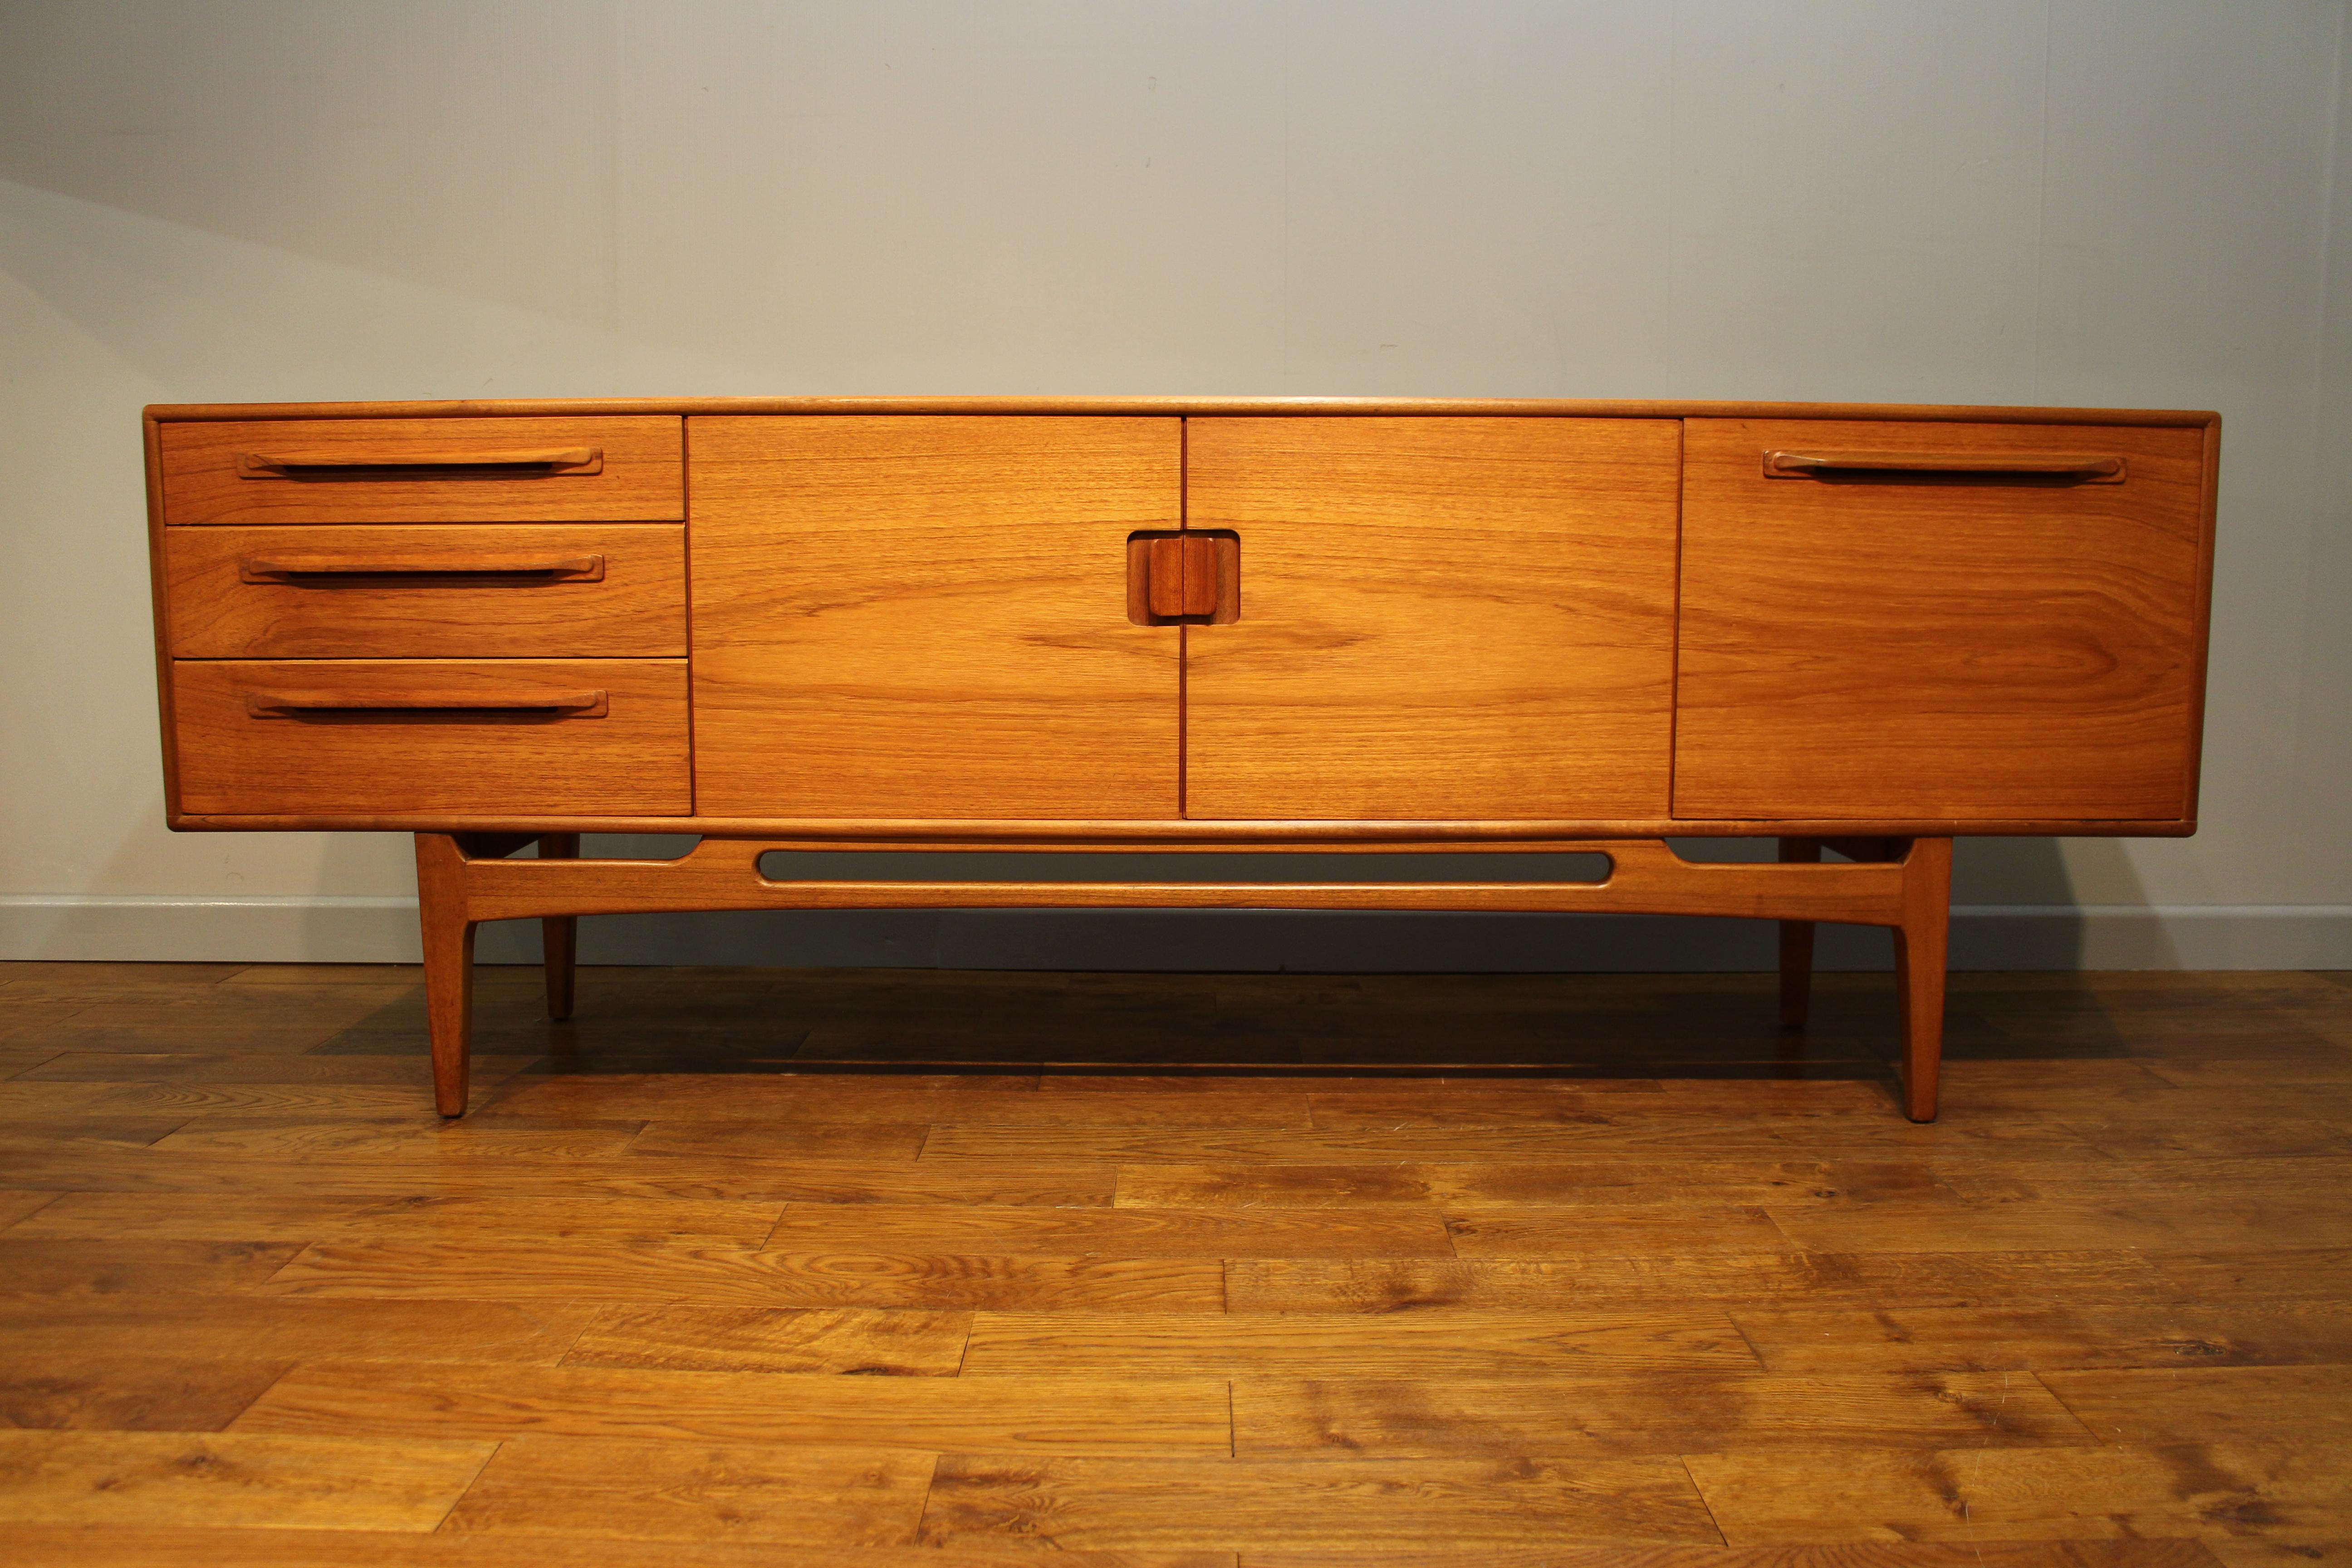 1960s Vintage Beithcraft Teak Sideboard 213cm S Pure